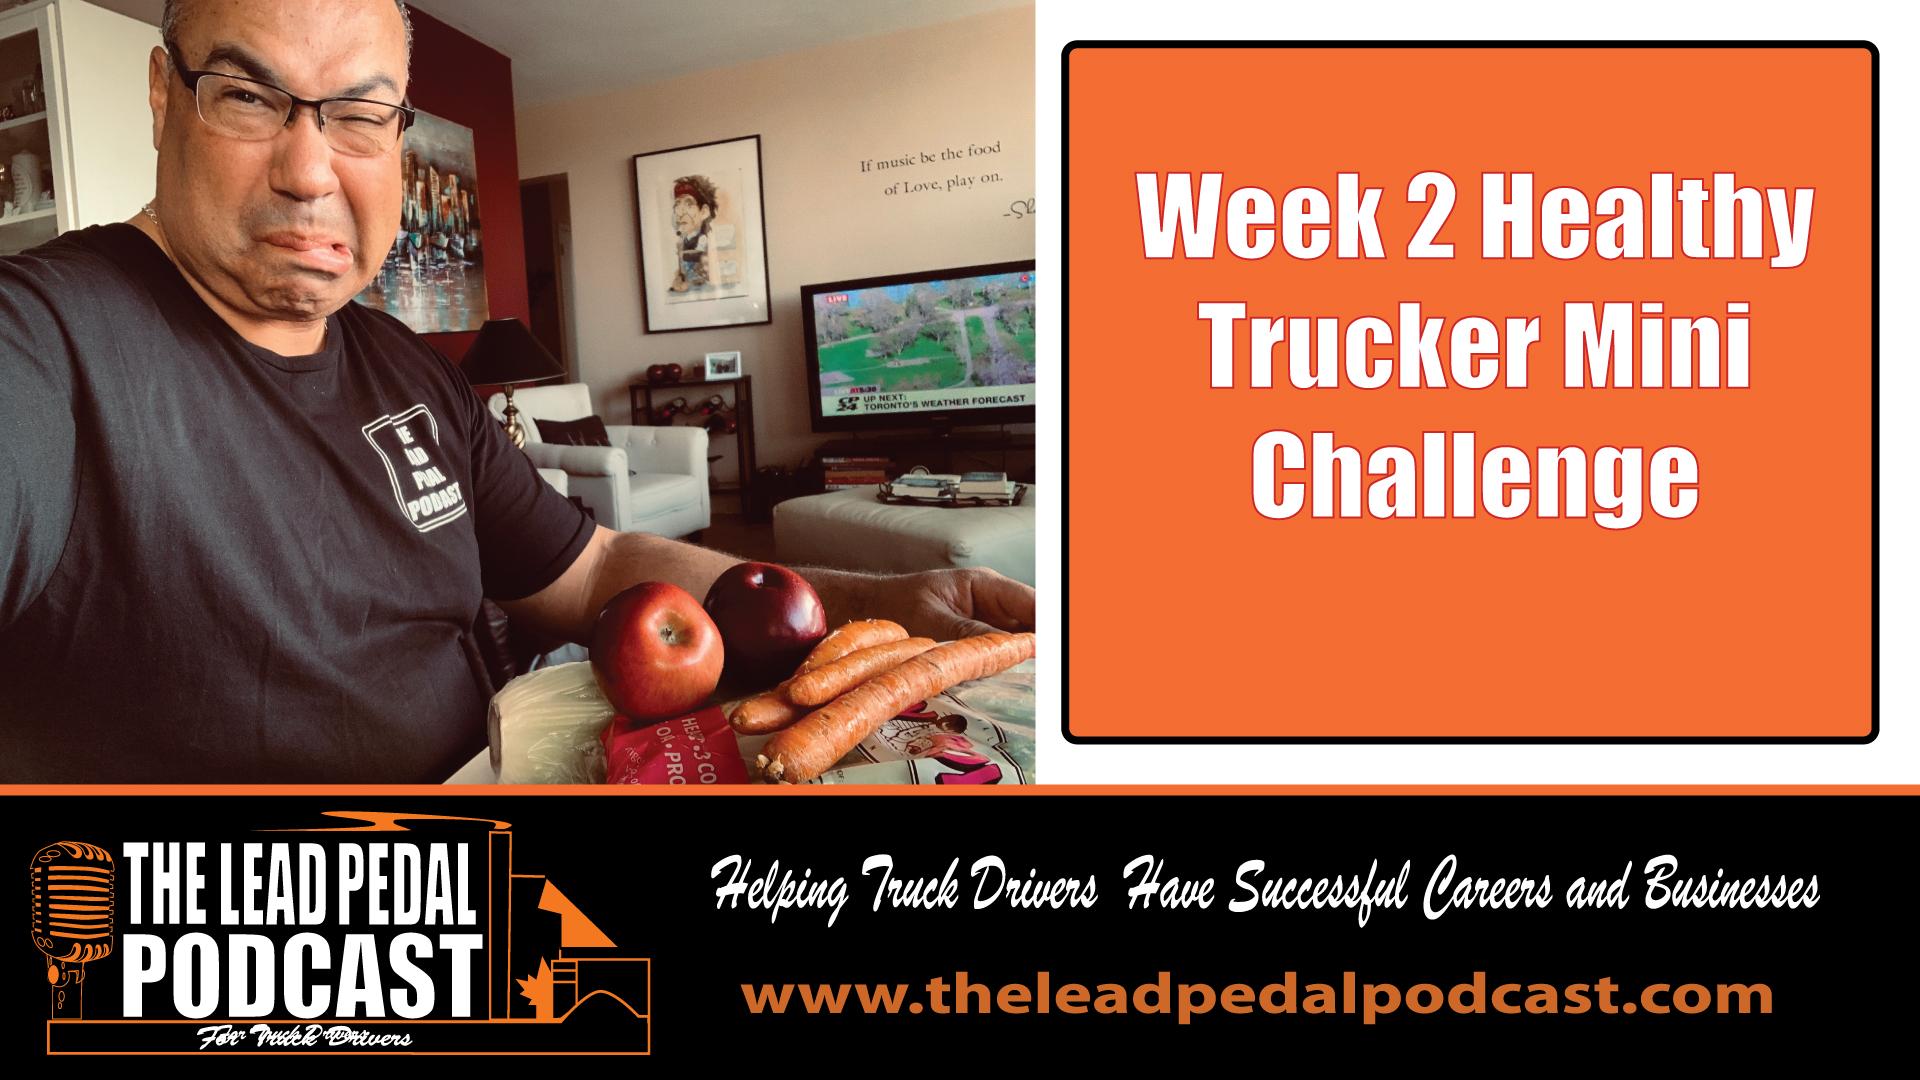 Health Challenge week 1 and 2